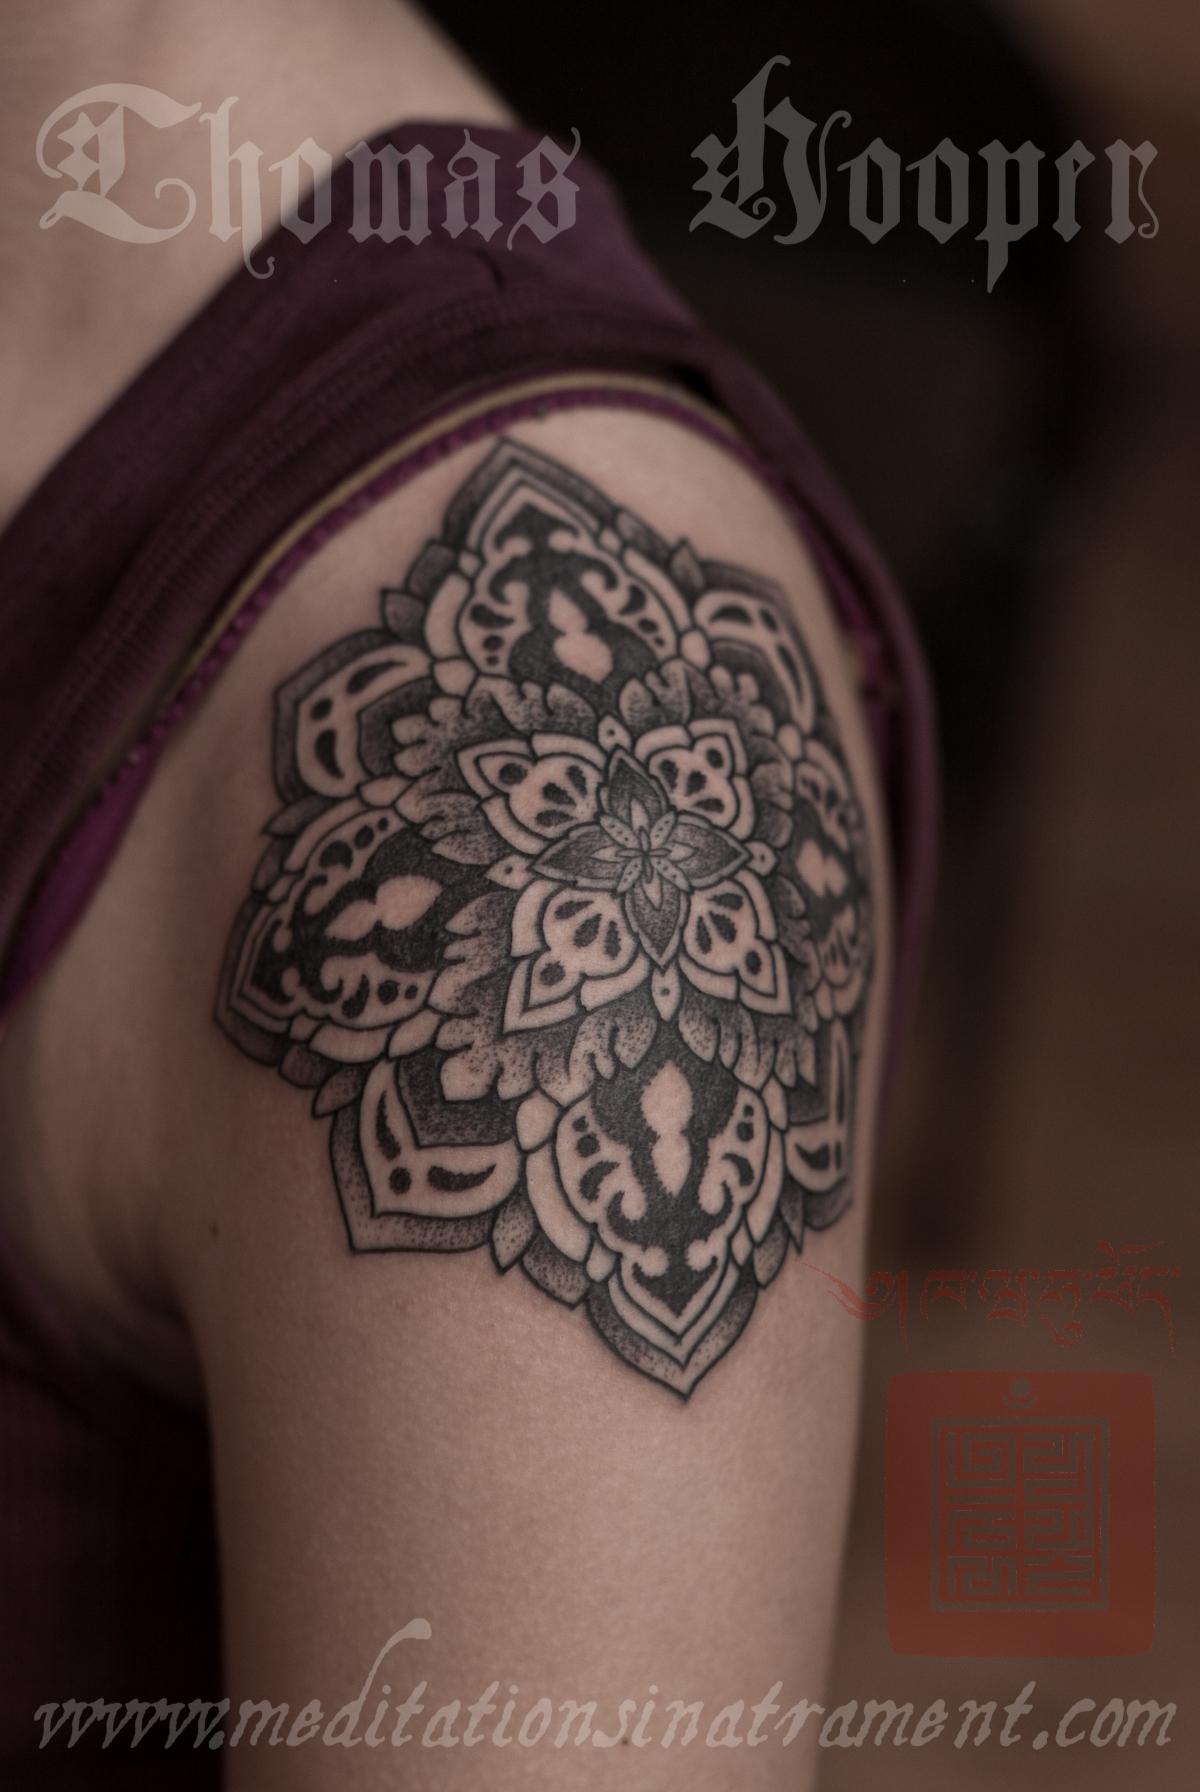 Shoulder Flower Tattoo – Tattooing By Thomas Hooper – 008 – November 09 2011